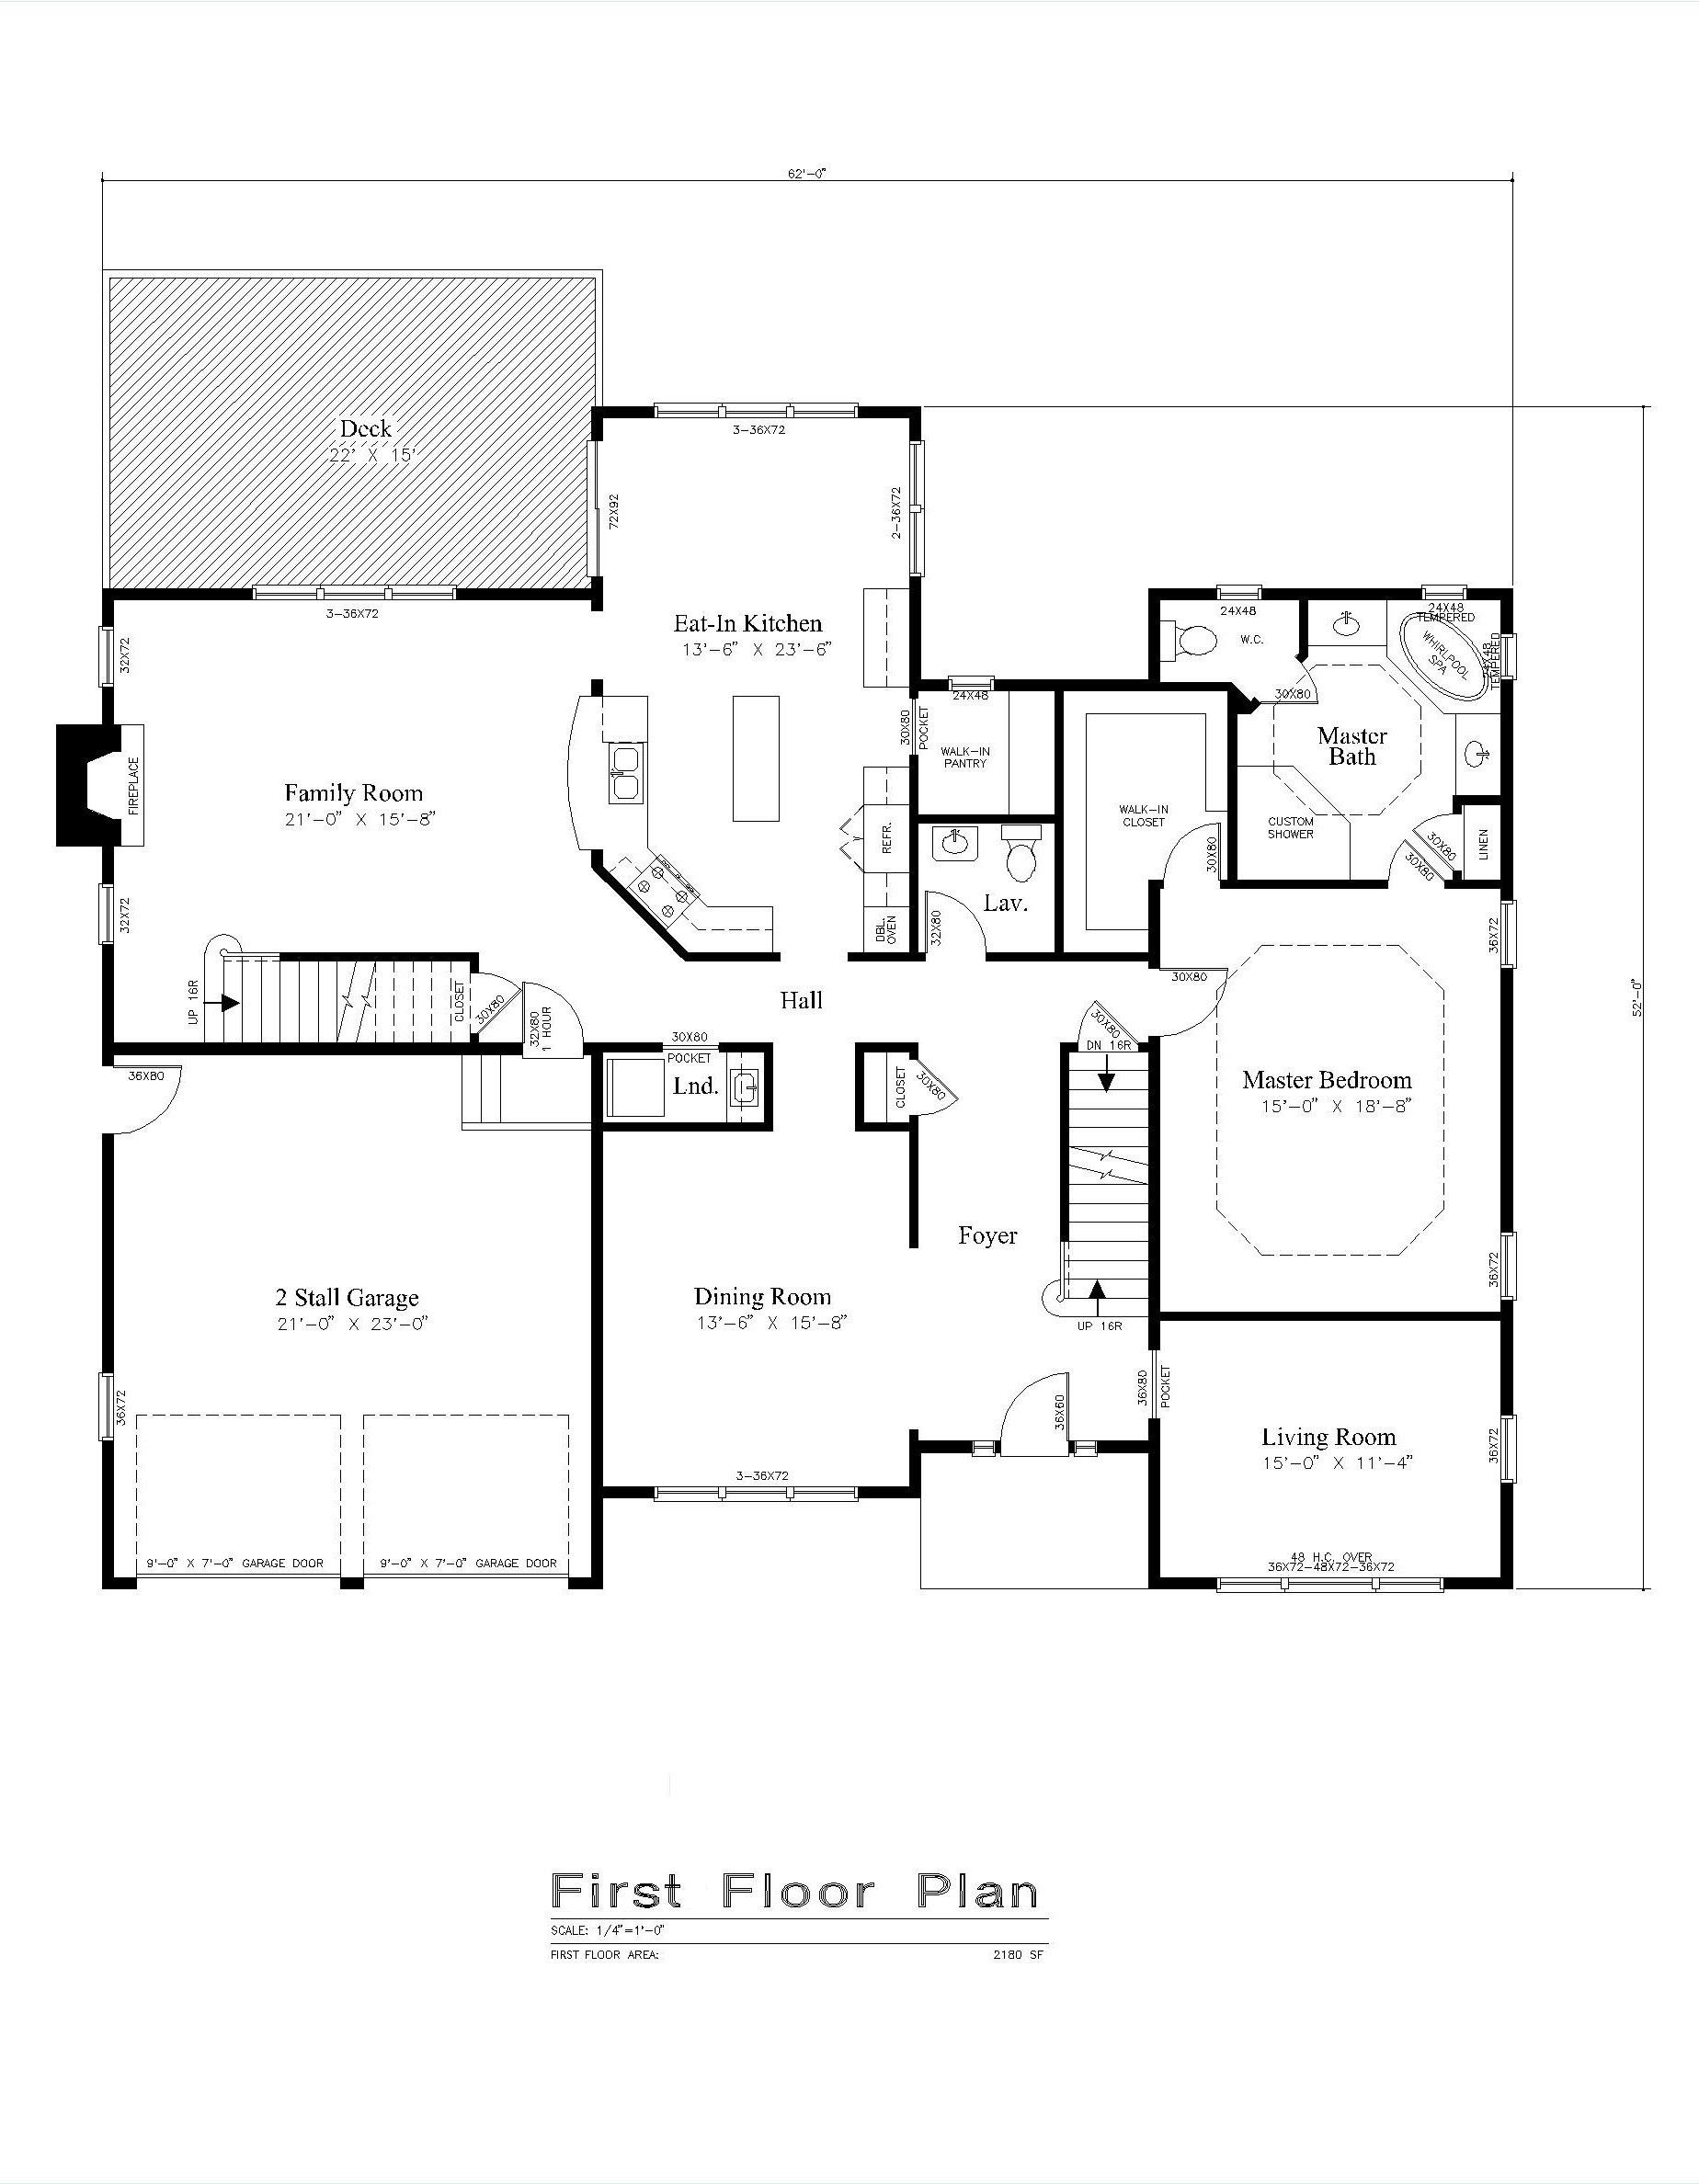 38-Stanwood-Road-9-5-13-First-Floor-Plan